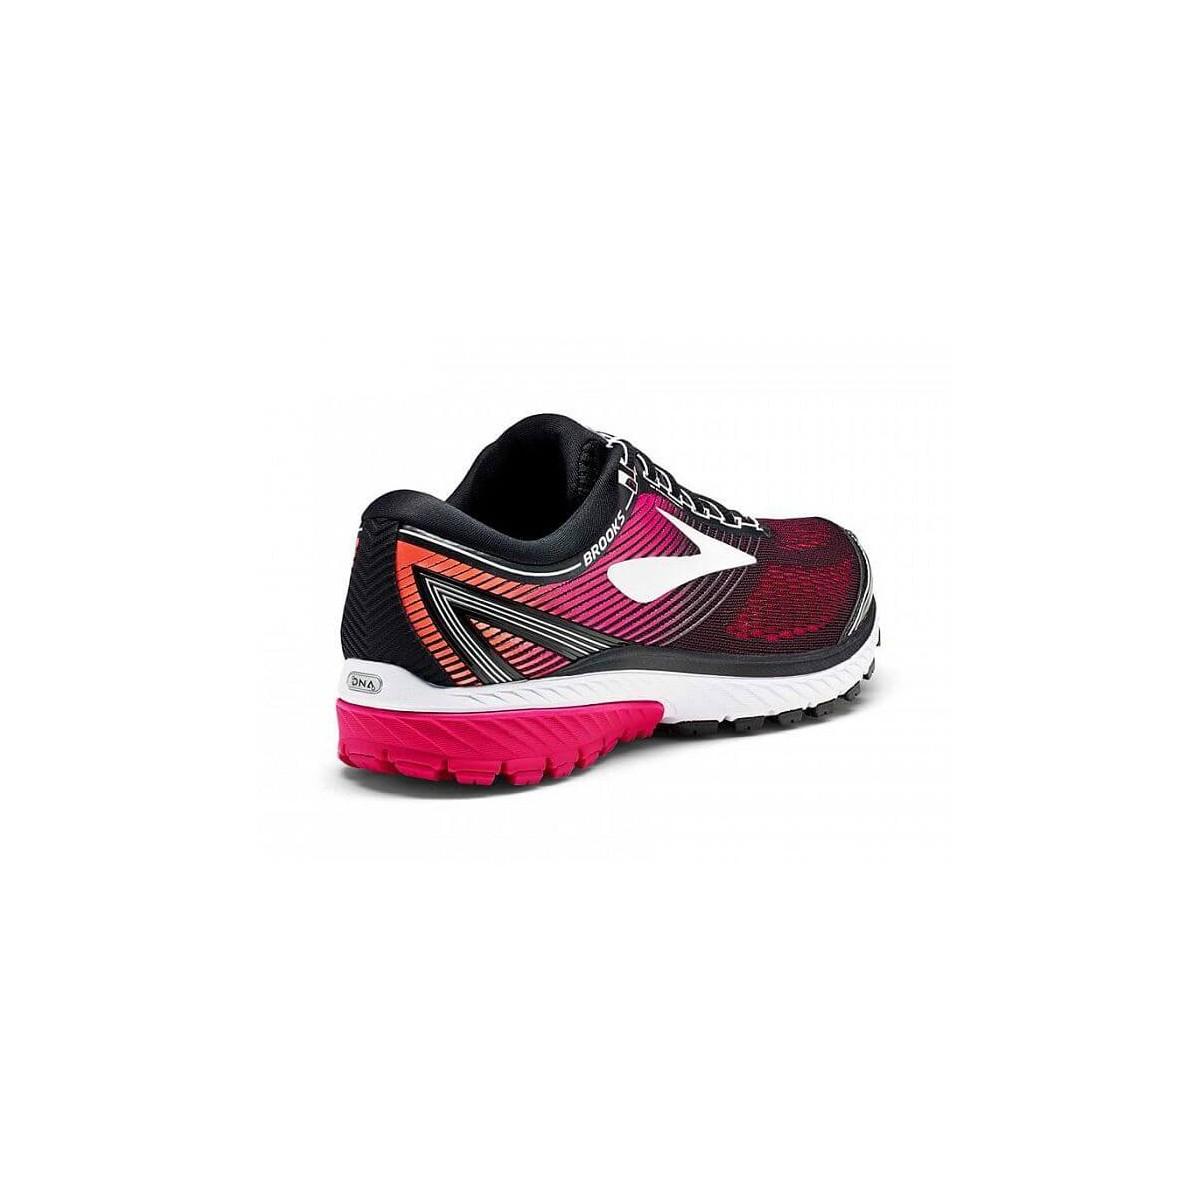 869e803bc1eb2 Zapatillas Running Brooks Ghost 10 color rosa y negro OI17 Mujer